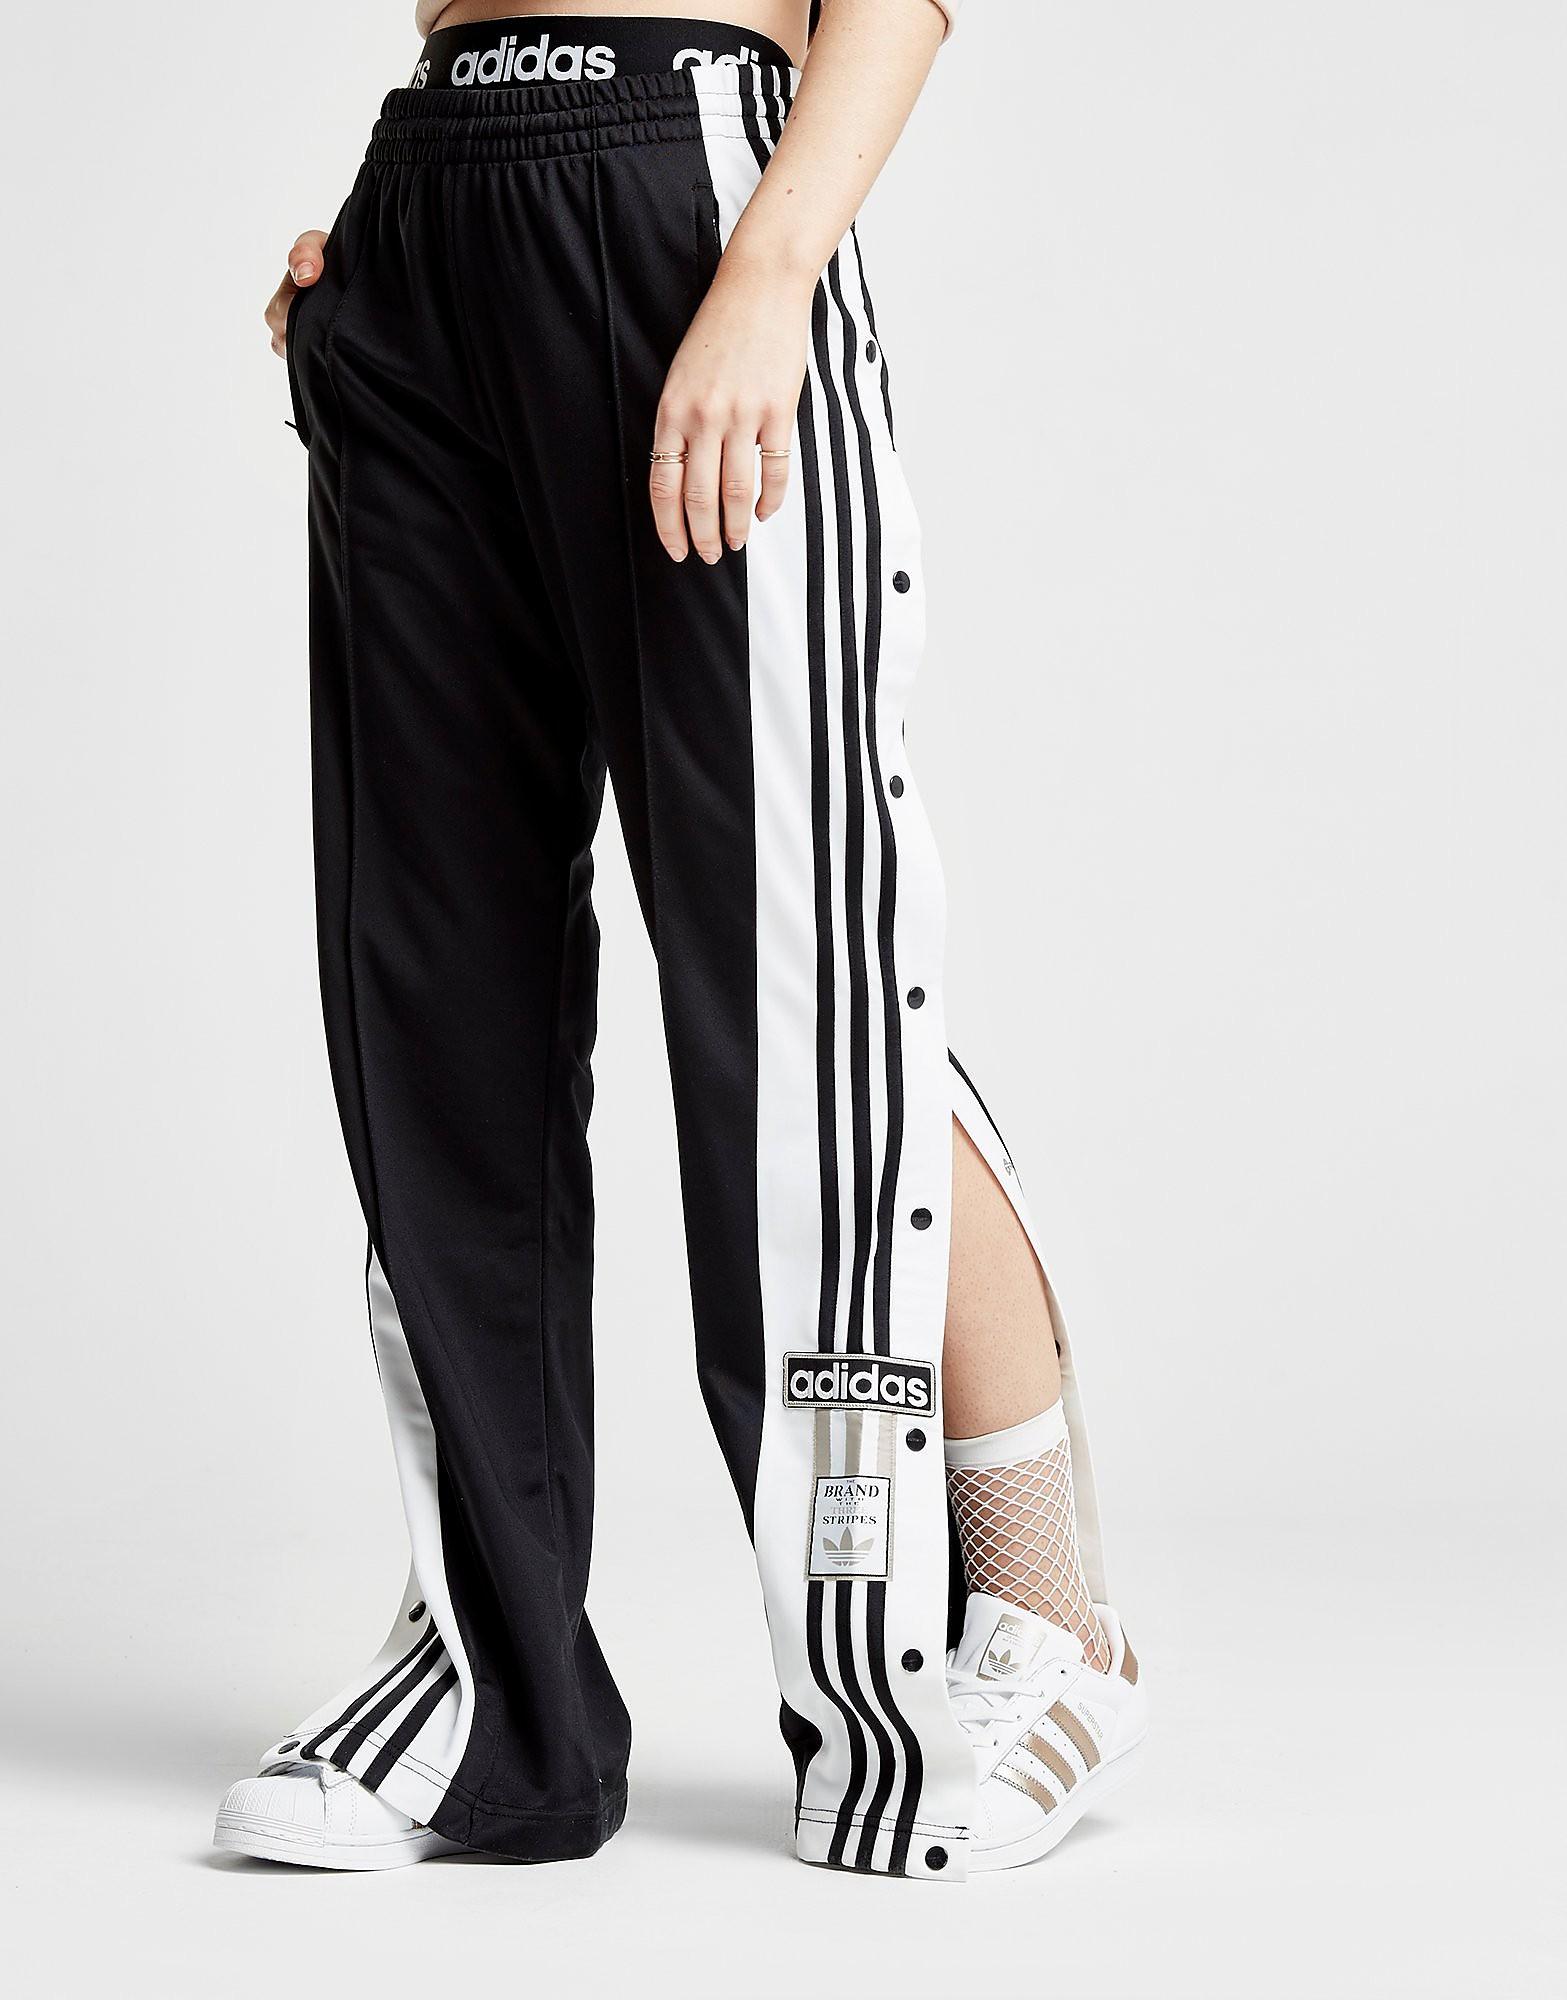 adidas Originals Adibreak Popper Pantaloni Donna